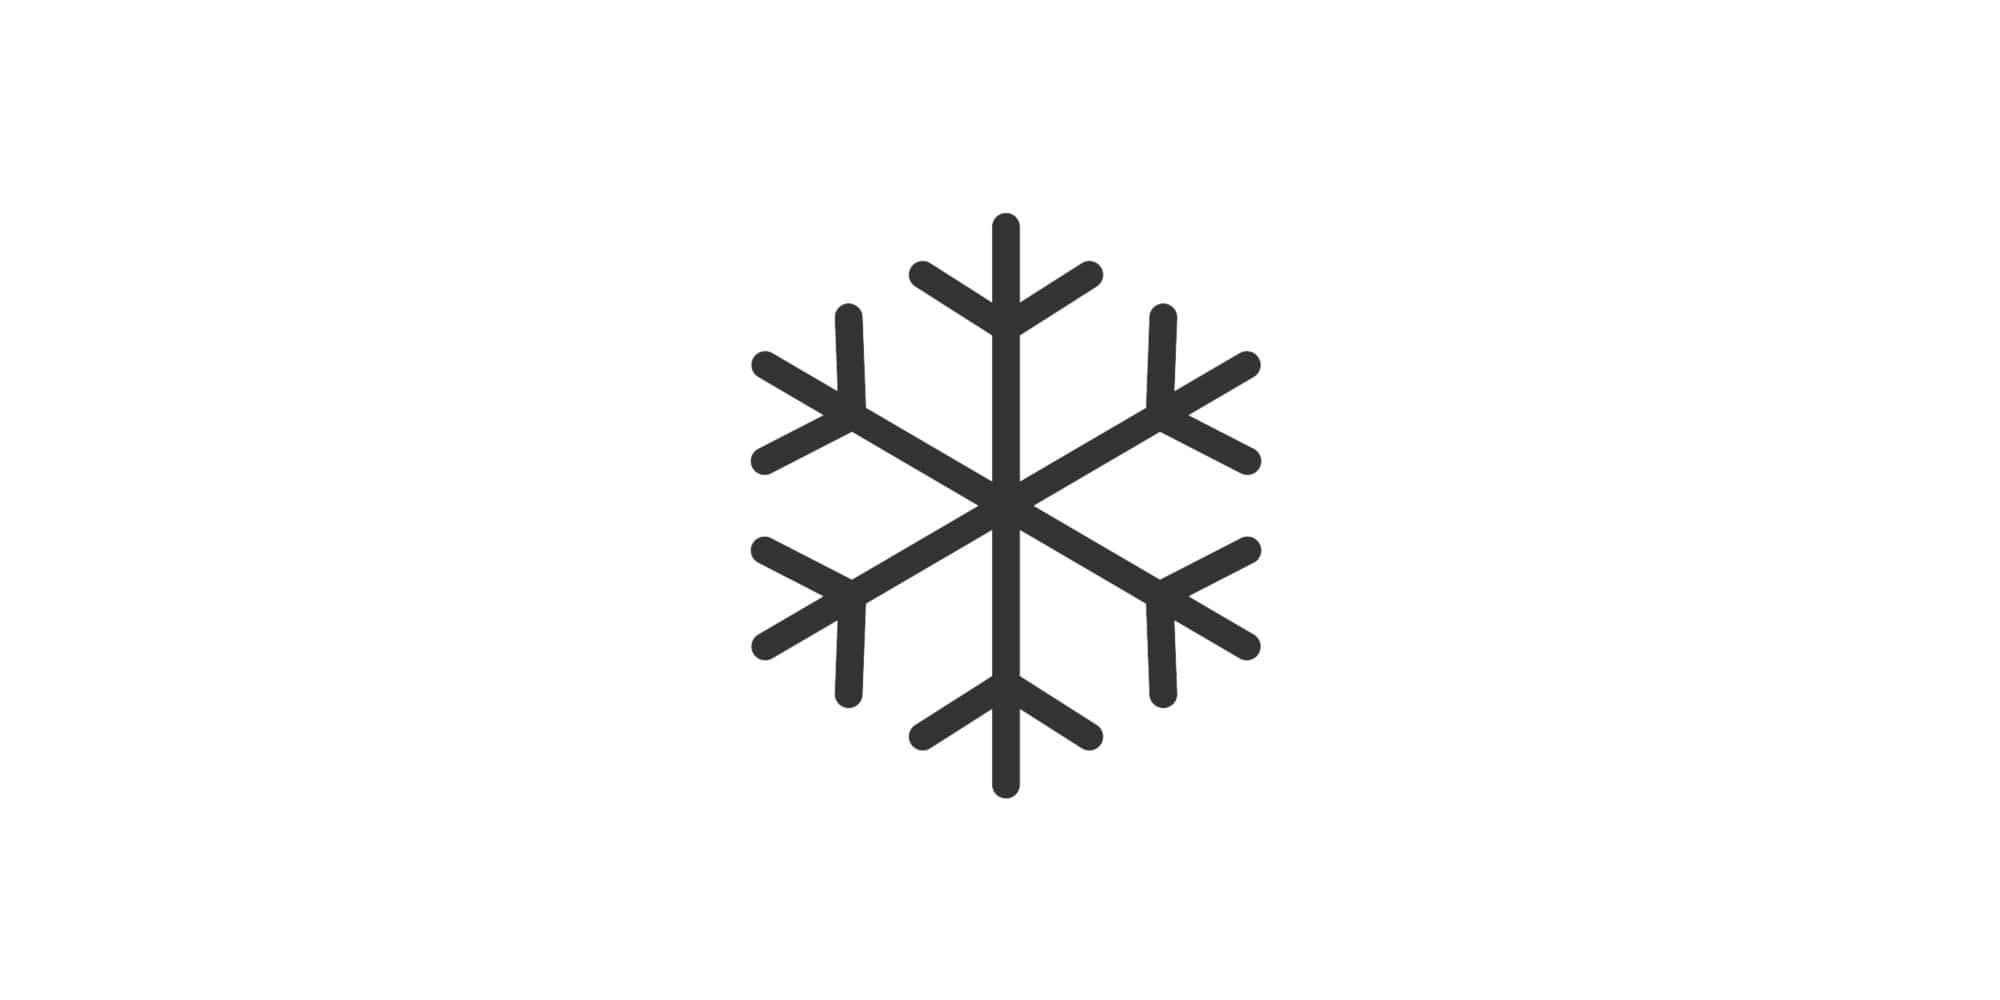 Refrigerateur.jpg